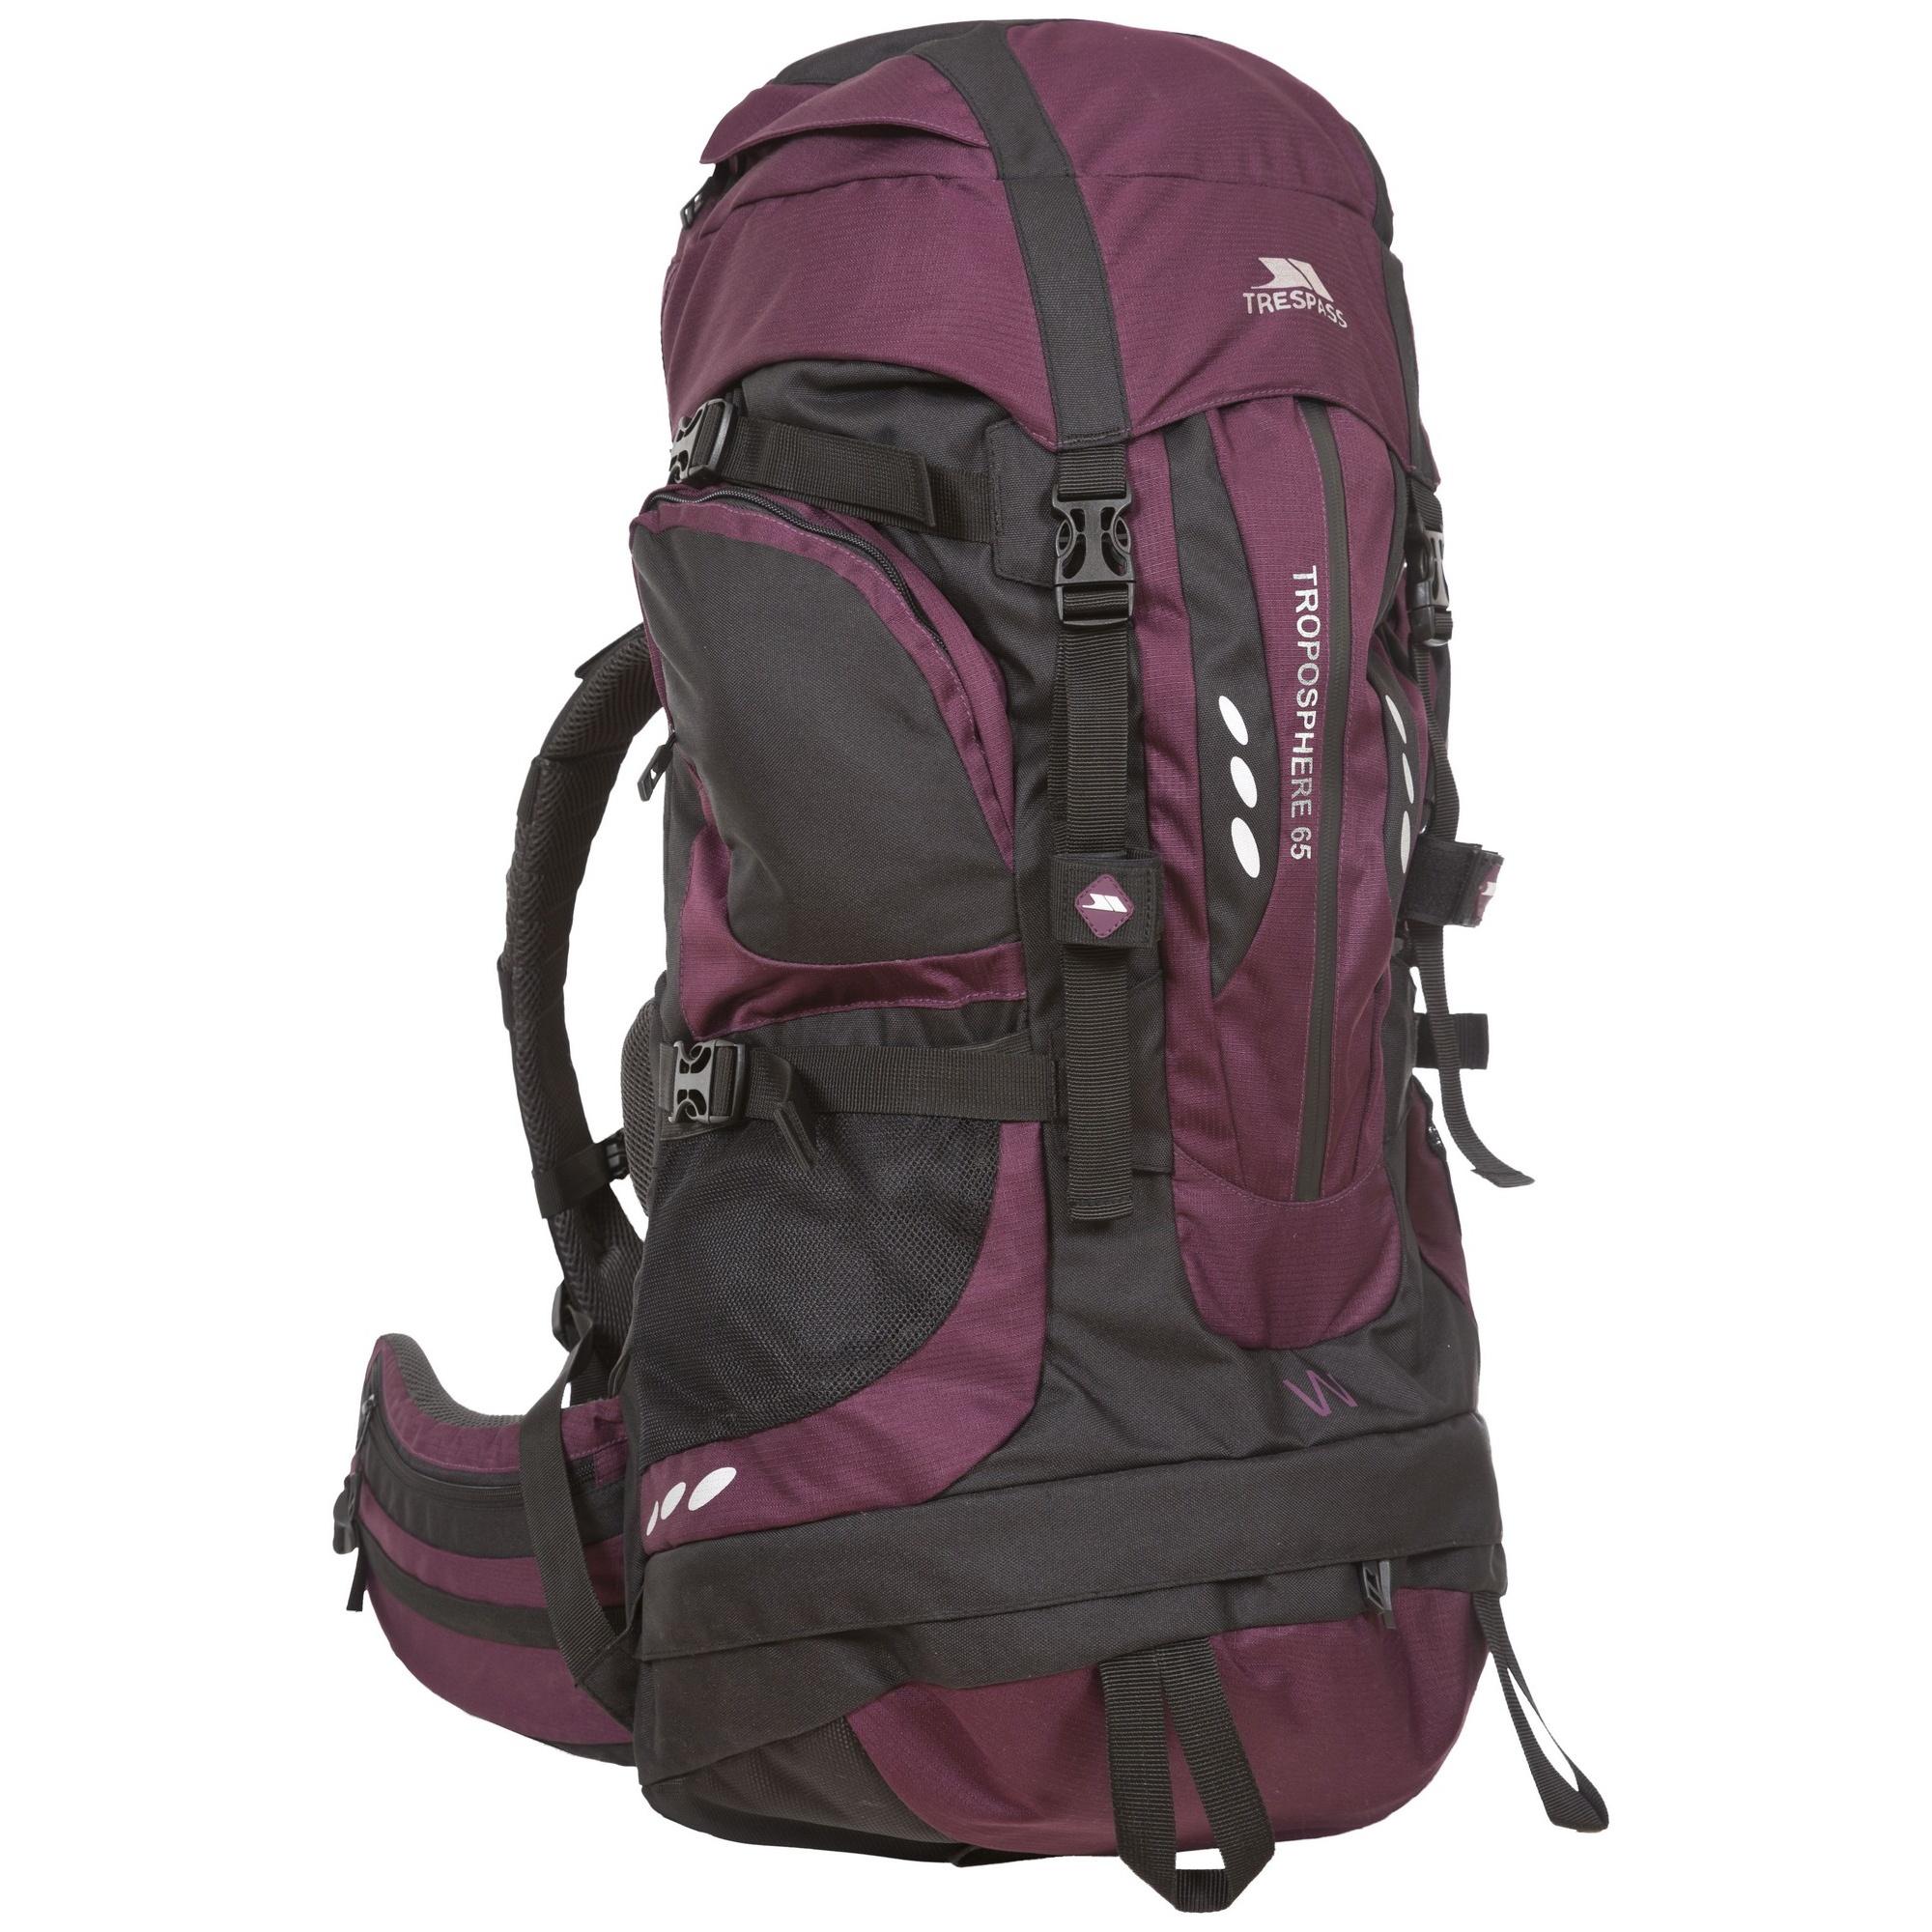 Womensladies 65 Liters Troposphere Trespass Hiking Backpack 4xqd4SB